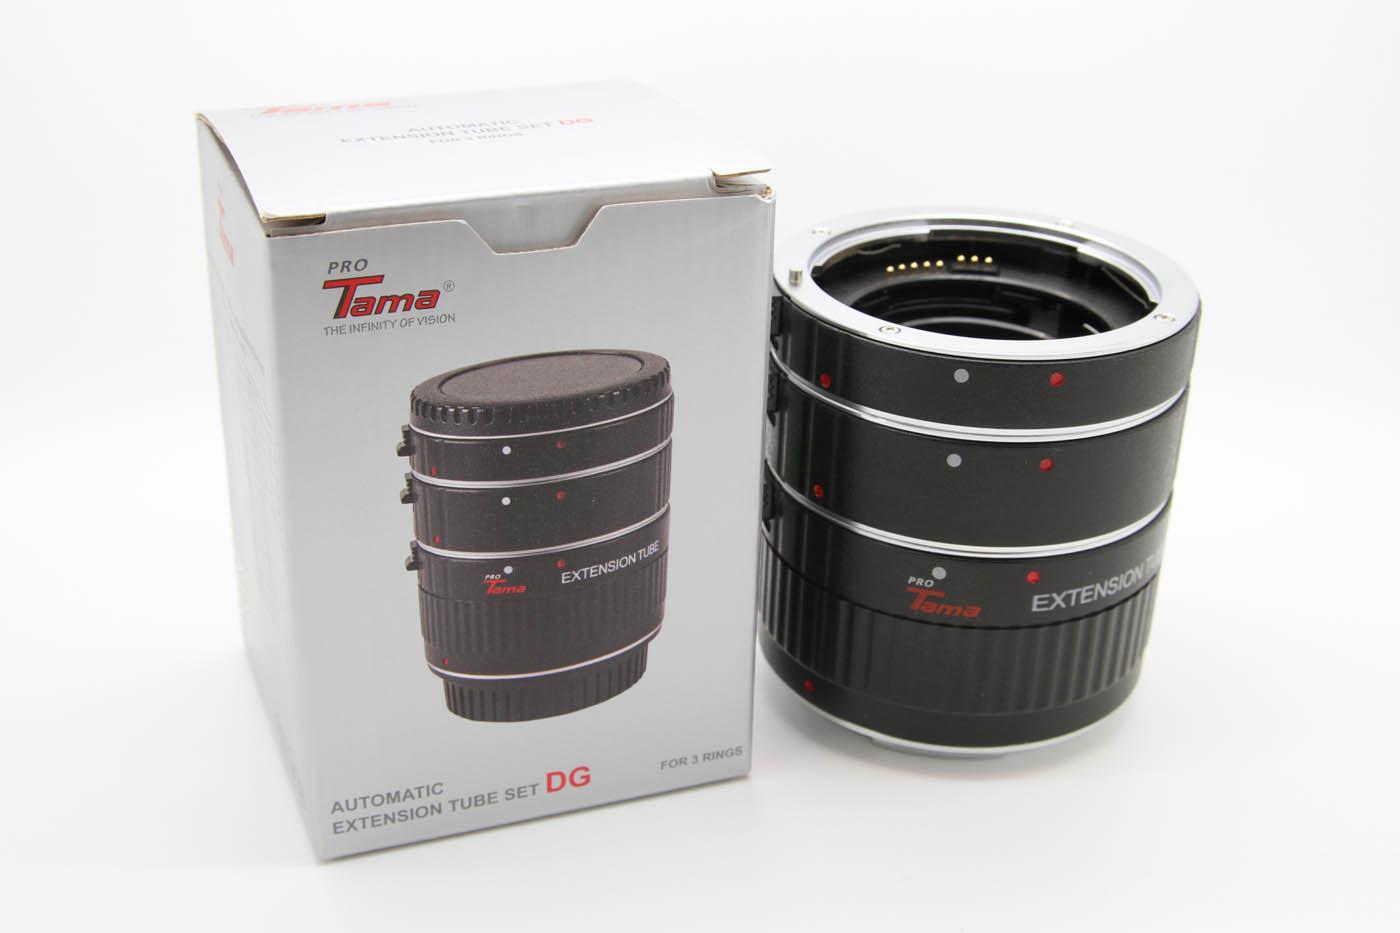 ProTama Auto Focus Macro Extension Tube Set DG-C (For Canon EOS EF/EFS Lens) - Packing